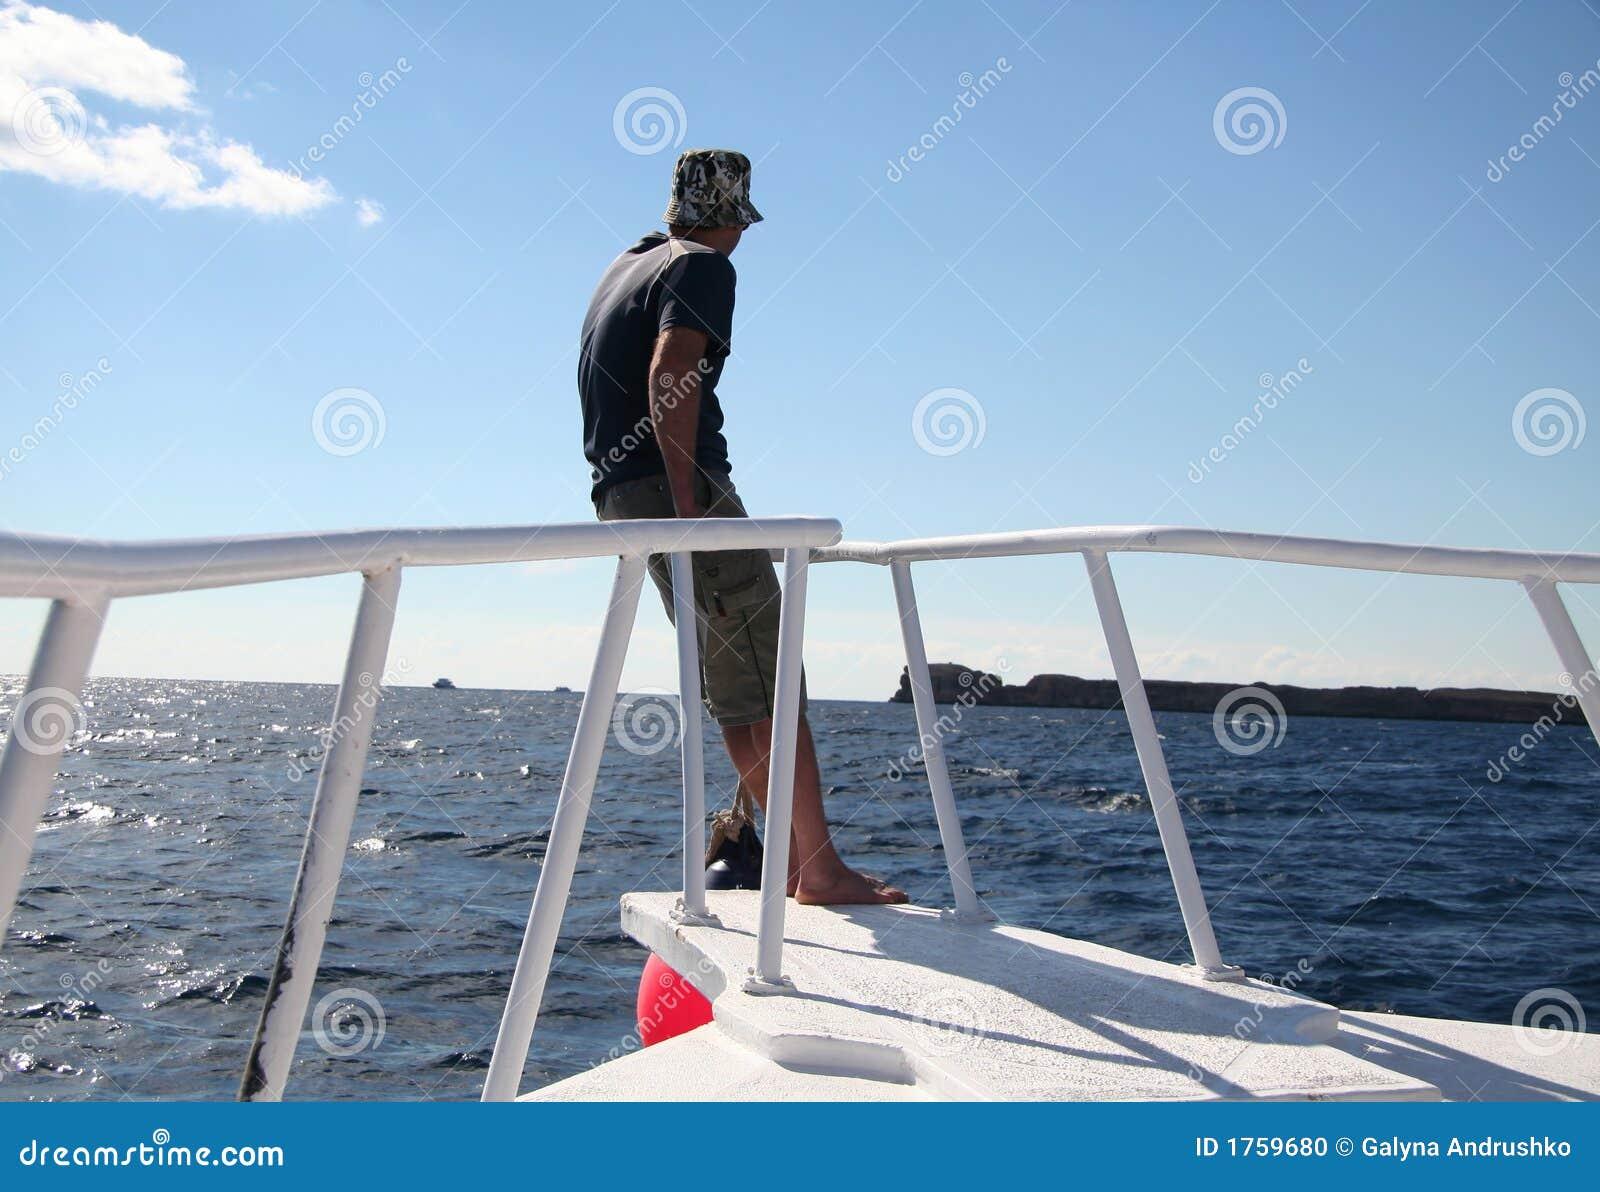 Man On The Sailing Boat Stock Photo - Image: 1759680